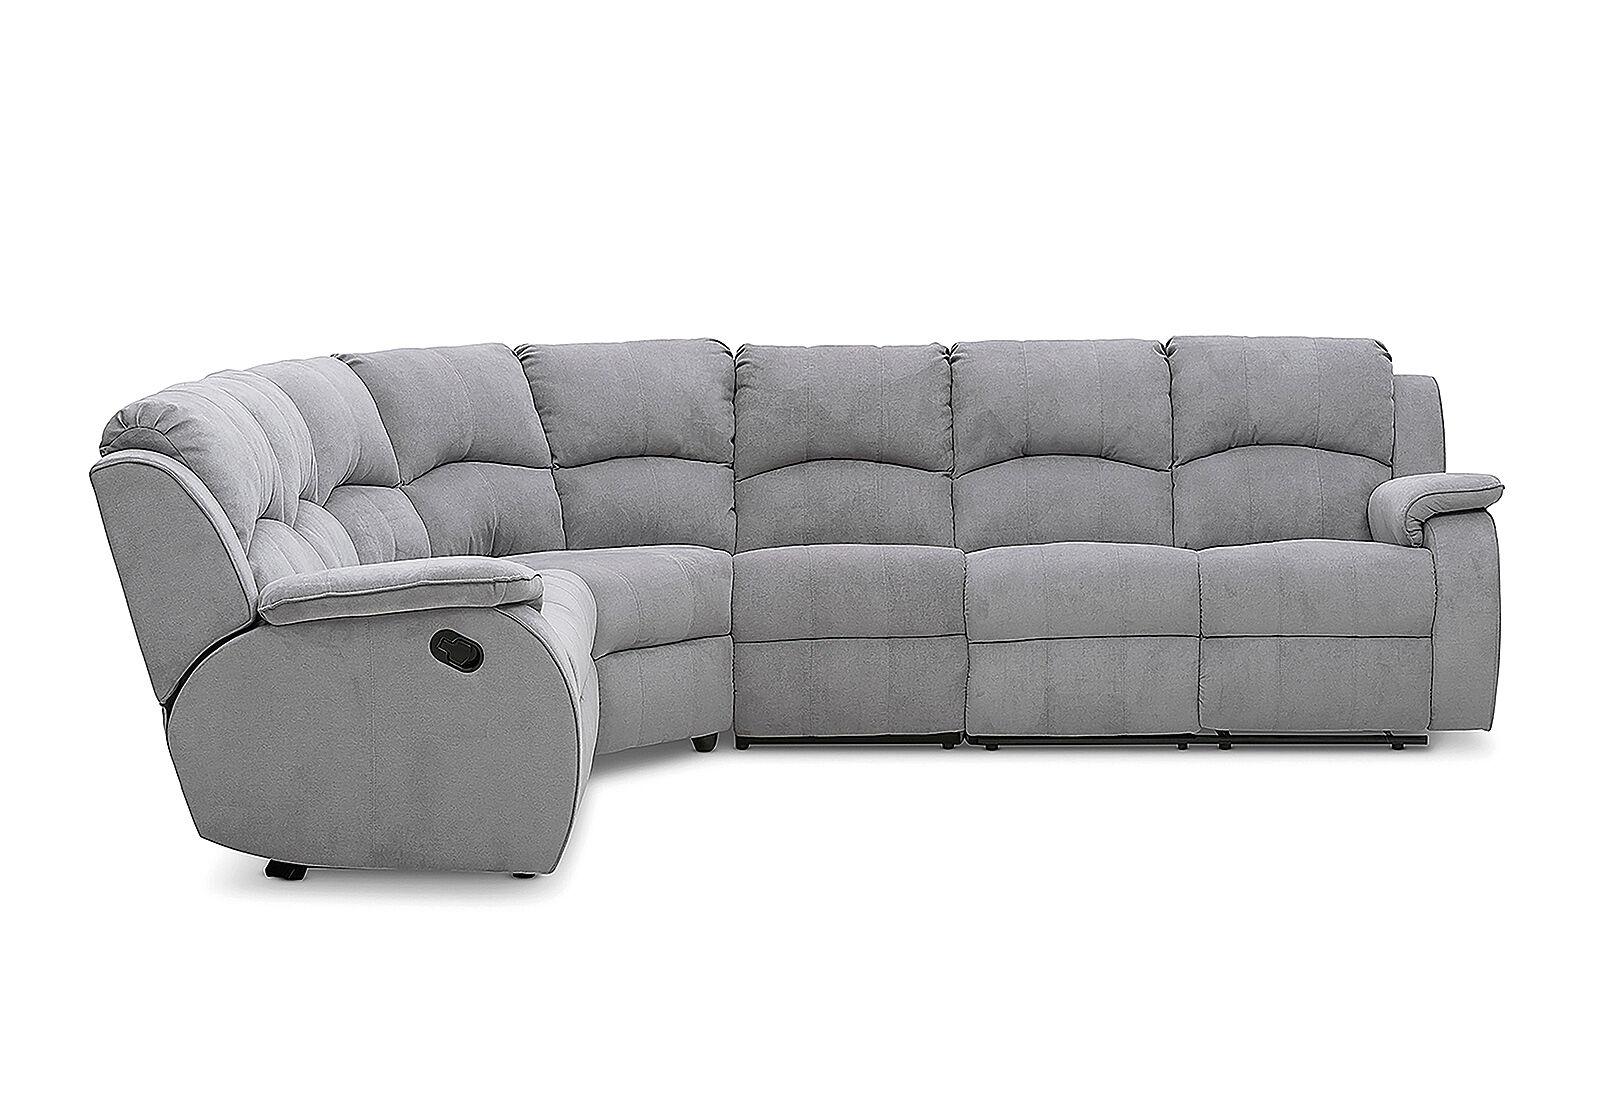 SALOON Fabric Corner Lounge with Inbuilt Recliners | Amart